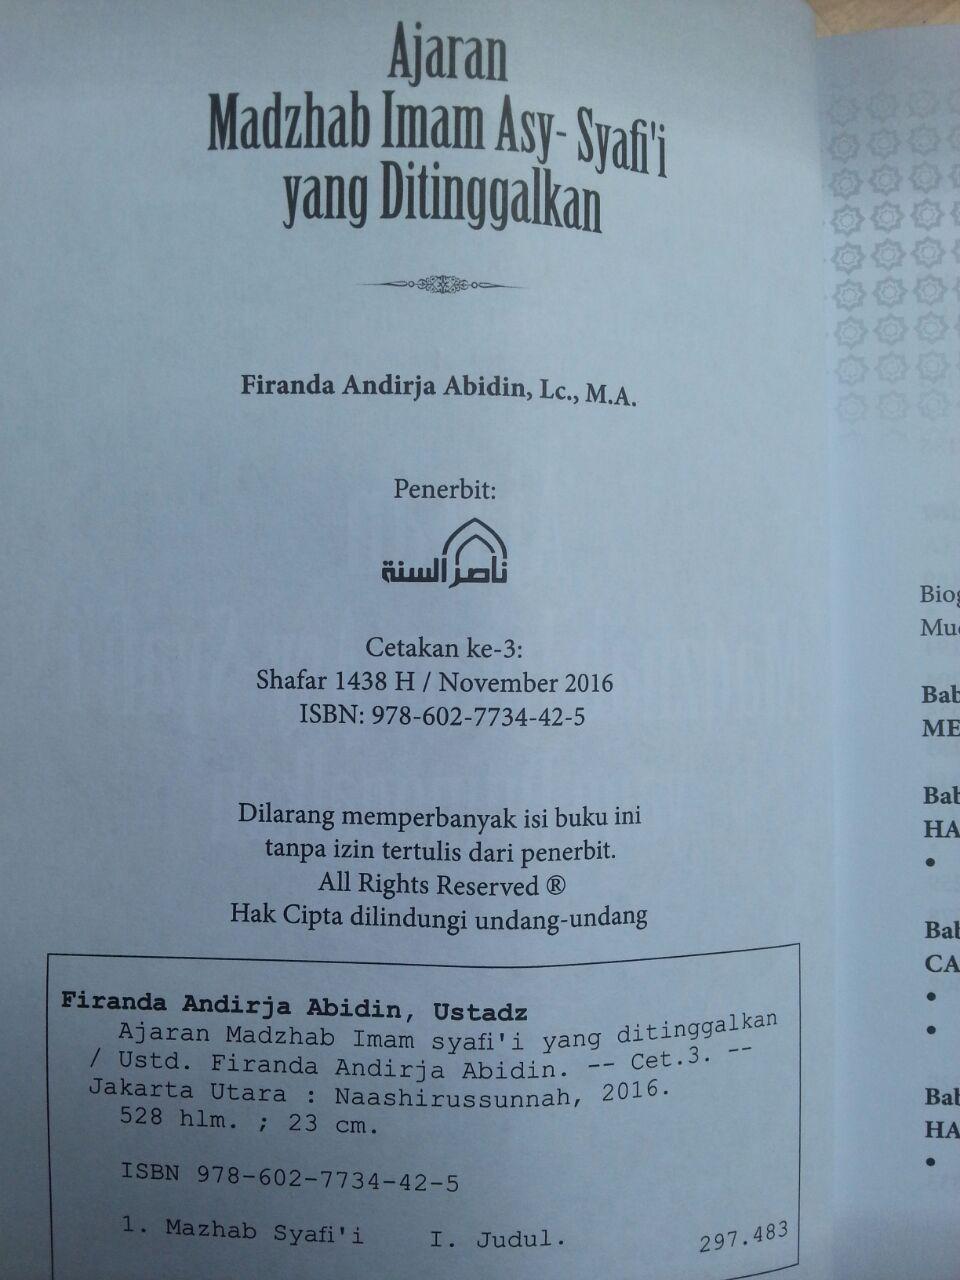 Buku Ajaran Madzhab Imam Asy-Syafii Yang Ditinggalkan isi